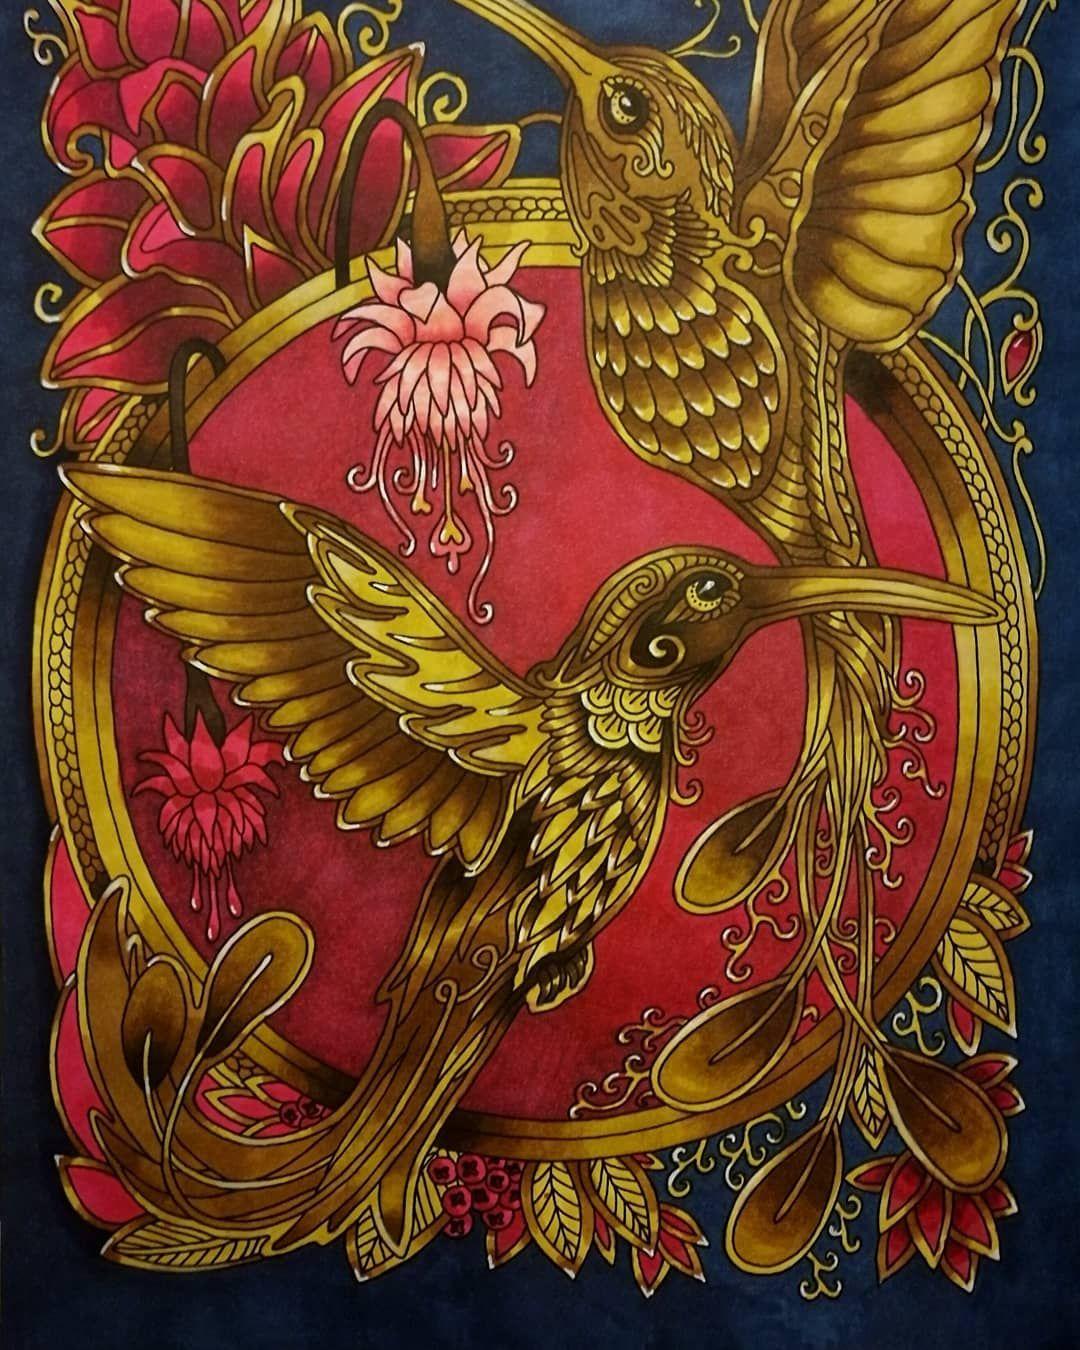 #veterunosittsvety #ветеруноситцветы | Раскраски, Цветы